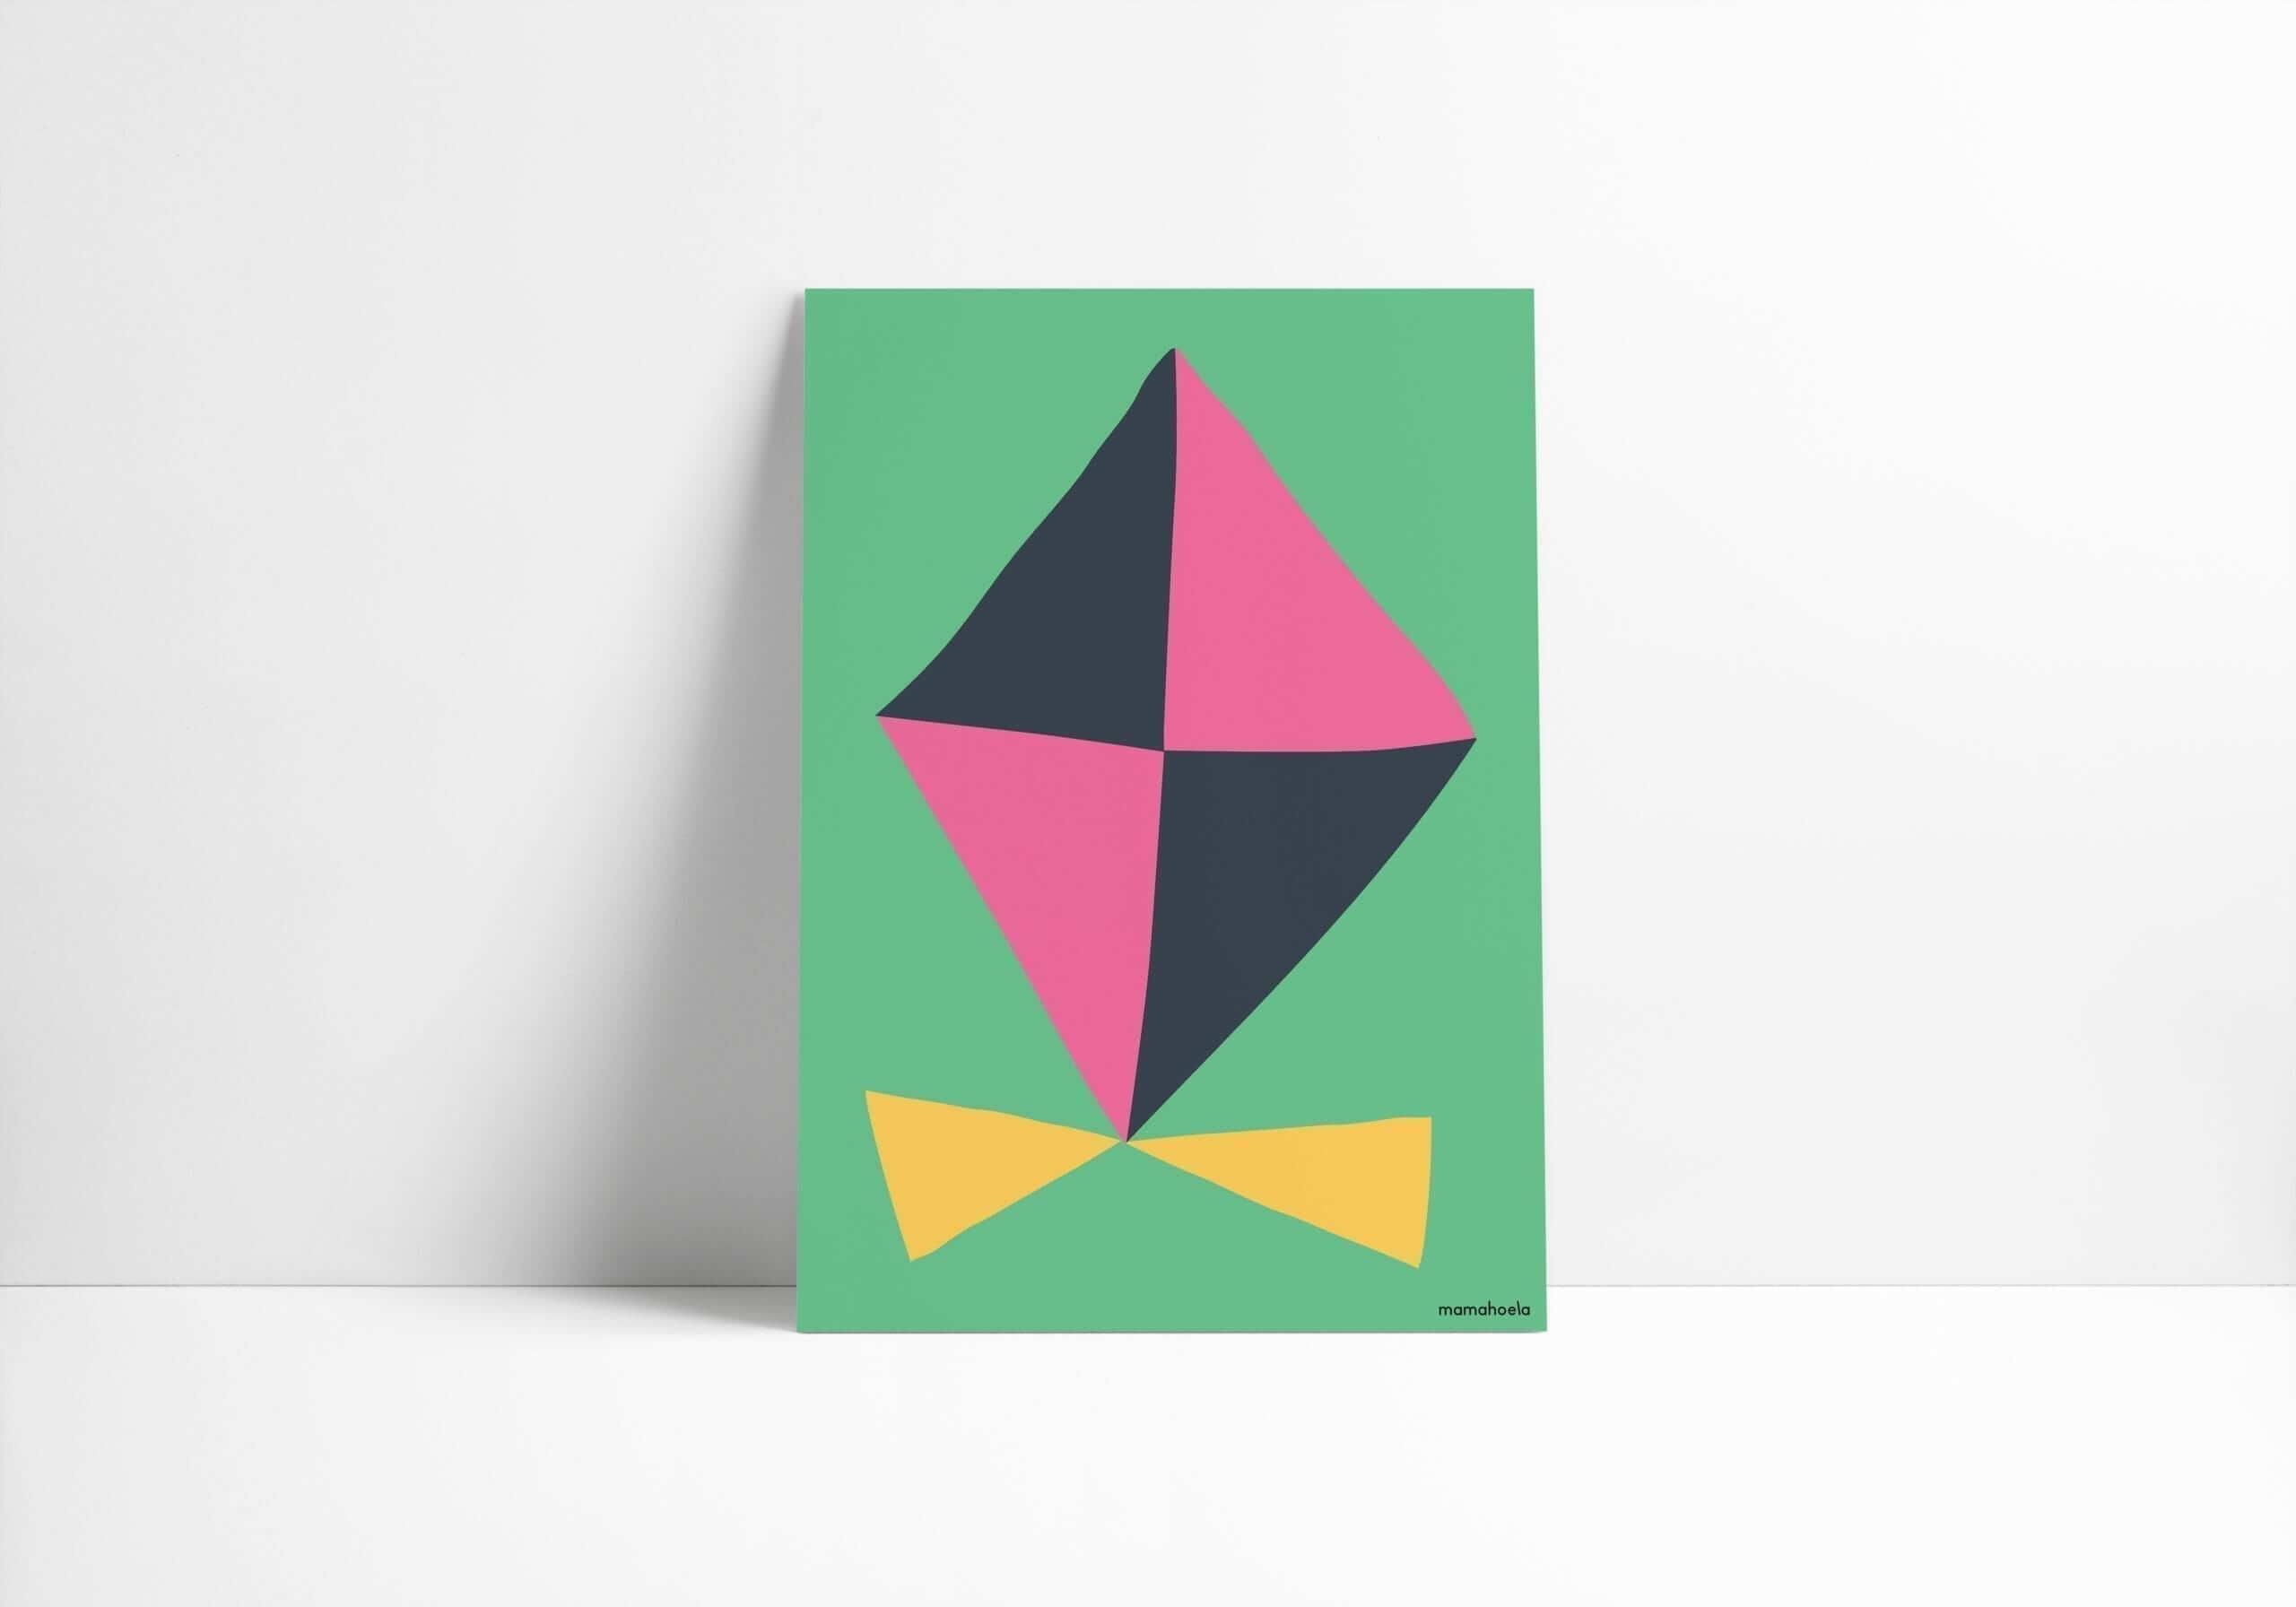 Mamahoela poster kite vertical